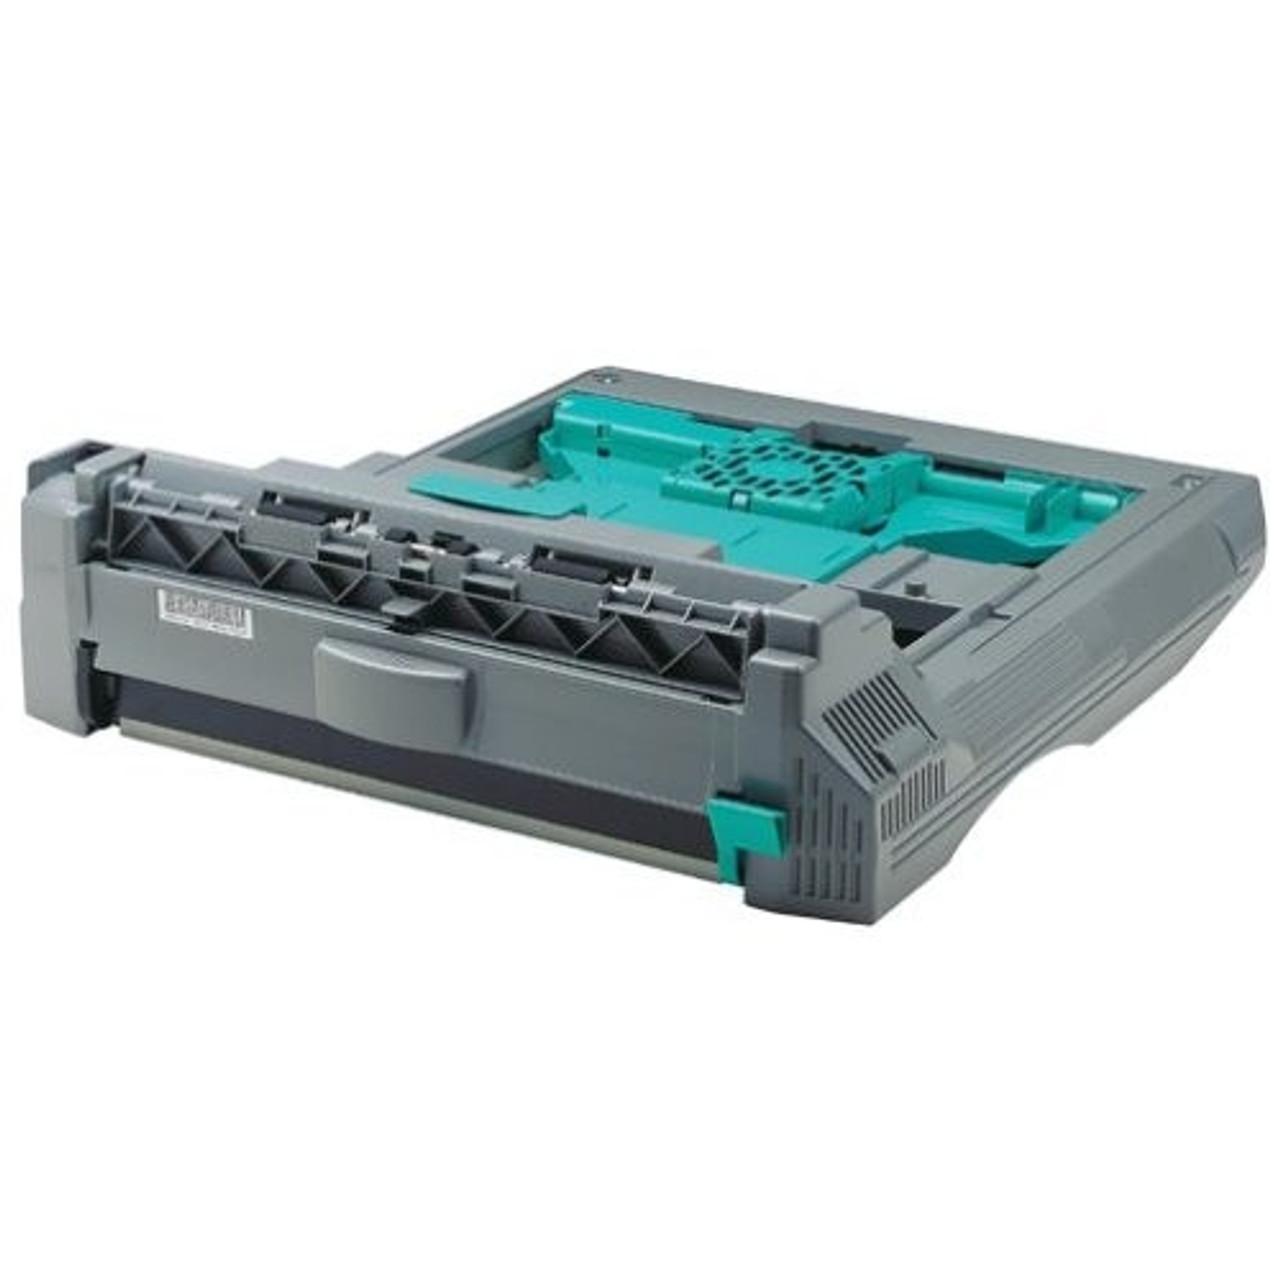 HP LaserJet 9000 9040 9050 Duplexer